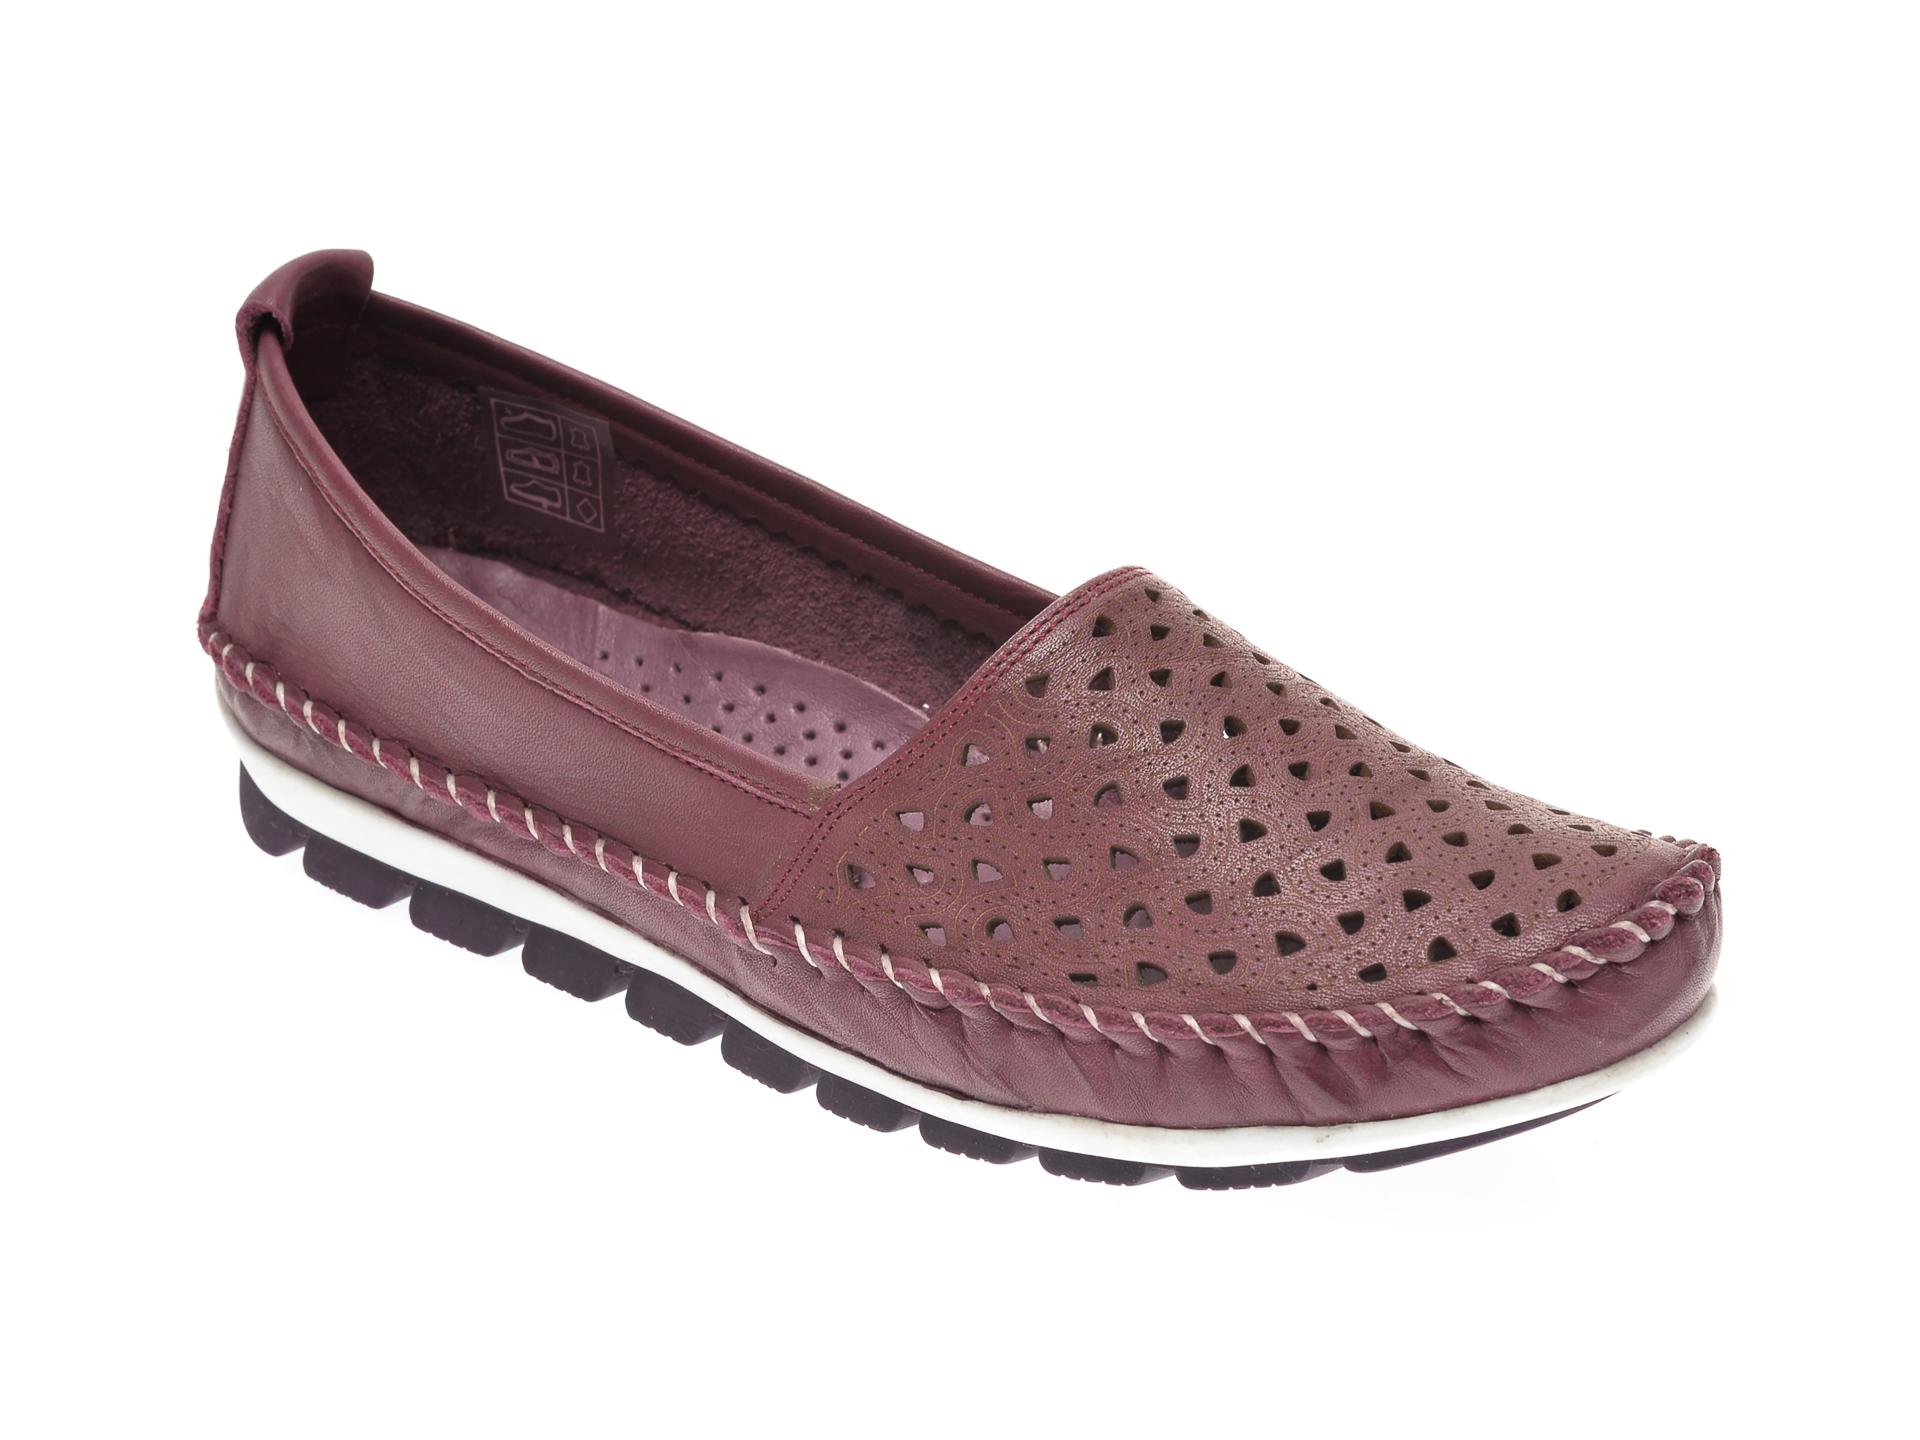 Pantofi MANLISA mov, 128, din piele naturala